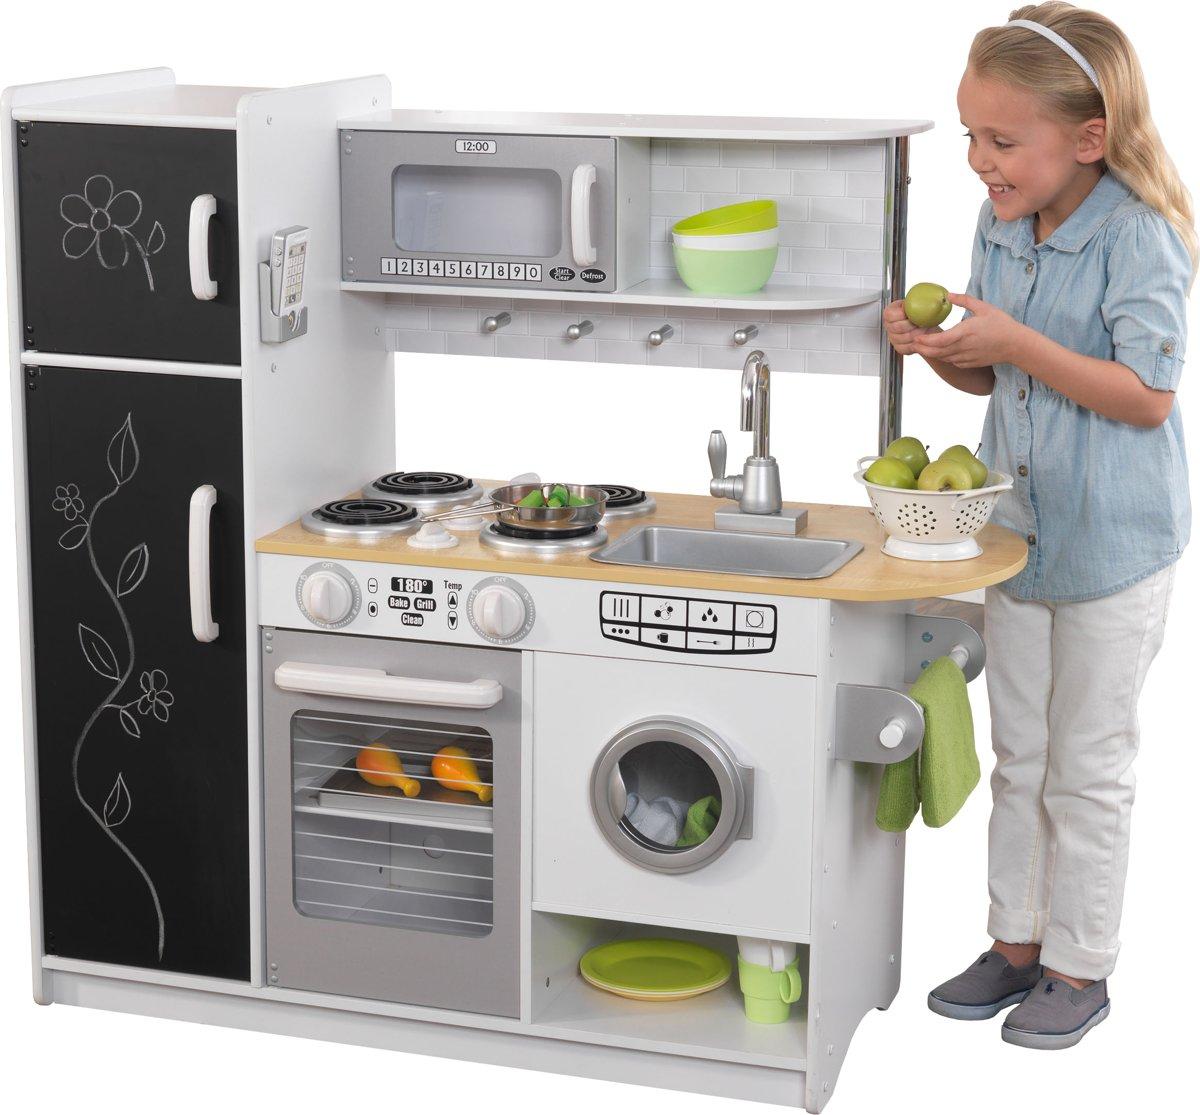 KidKraft Pepperpot Houten kinderkeuken